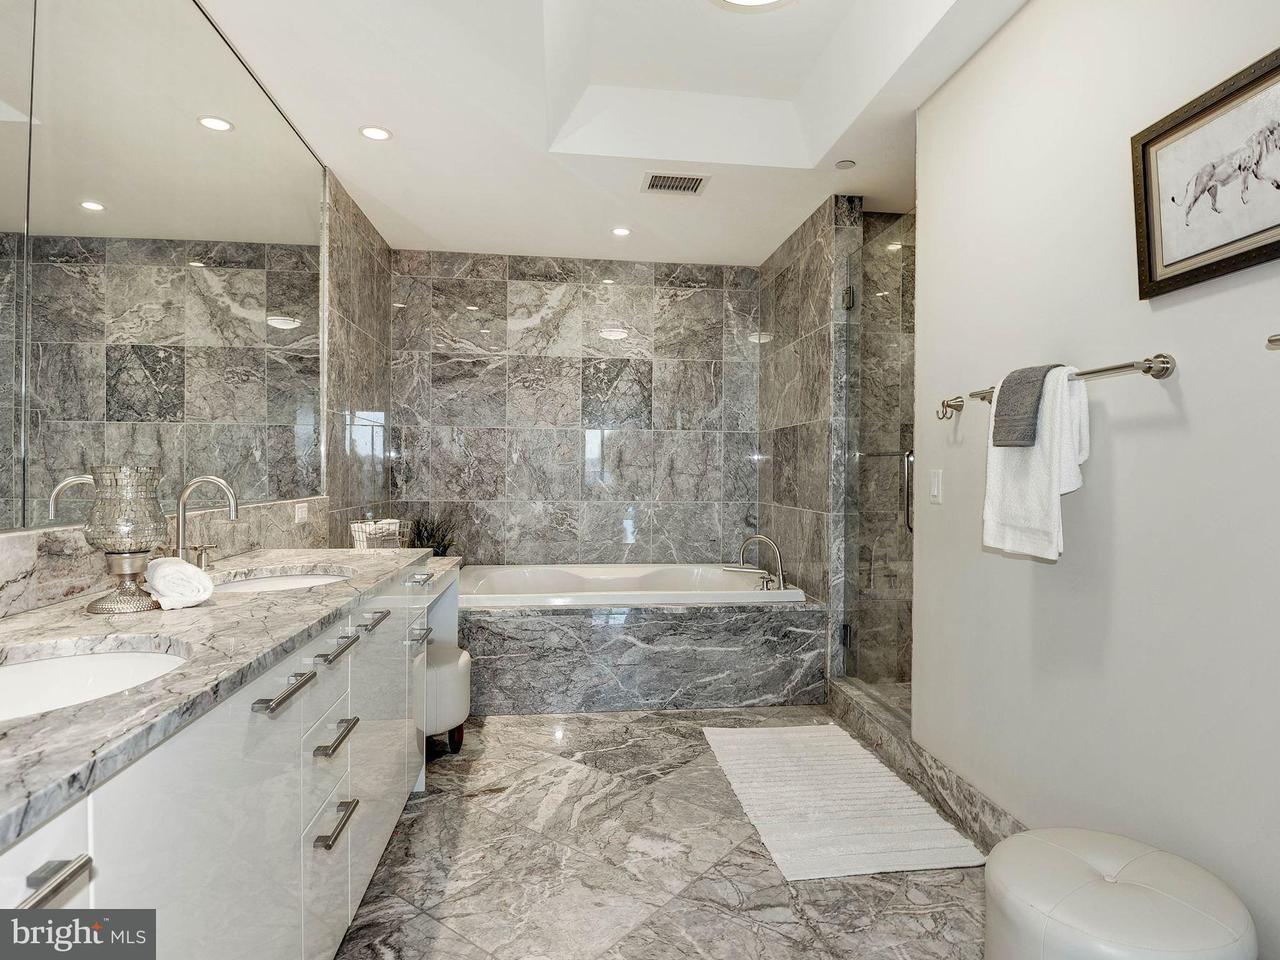 Additional photo for property listing at 1881 Nash St #1208 1881 Nash St #1208 Arlington, Virginia 22209 United States